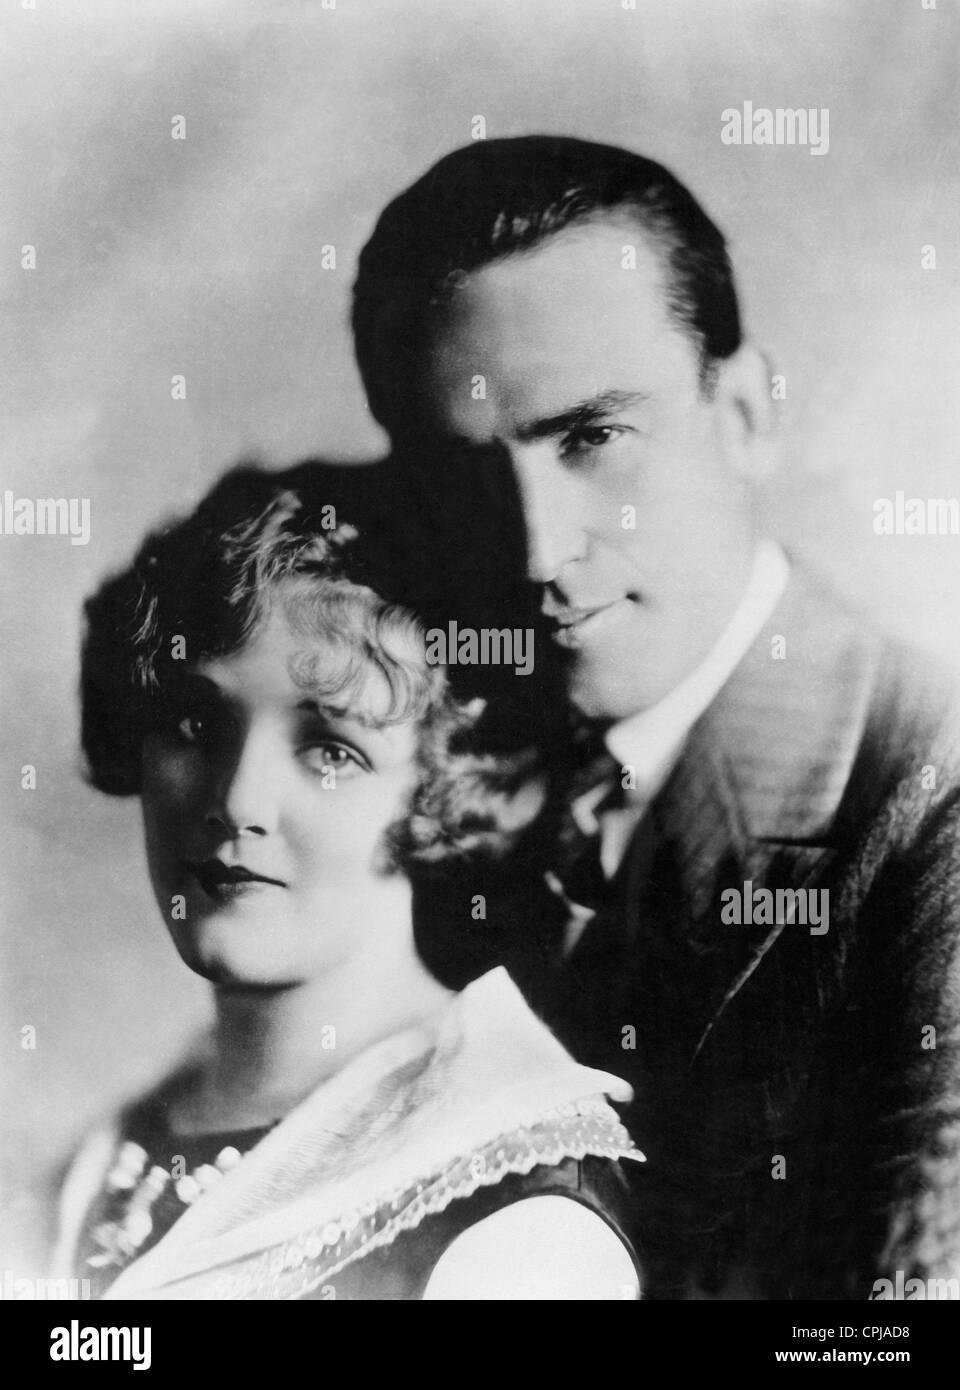 Harold Lloyd with Mildred Davis - Stock Image